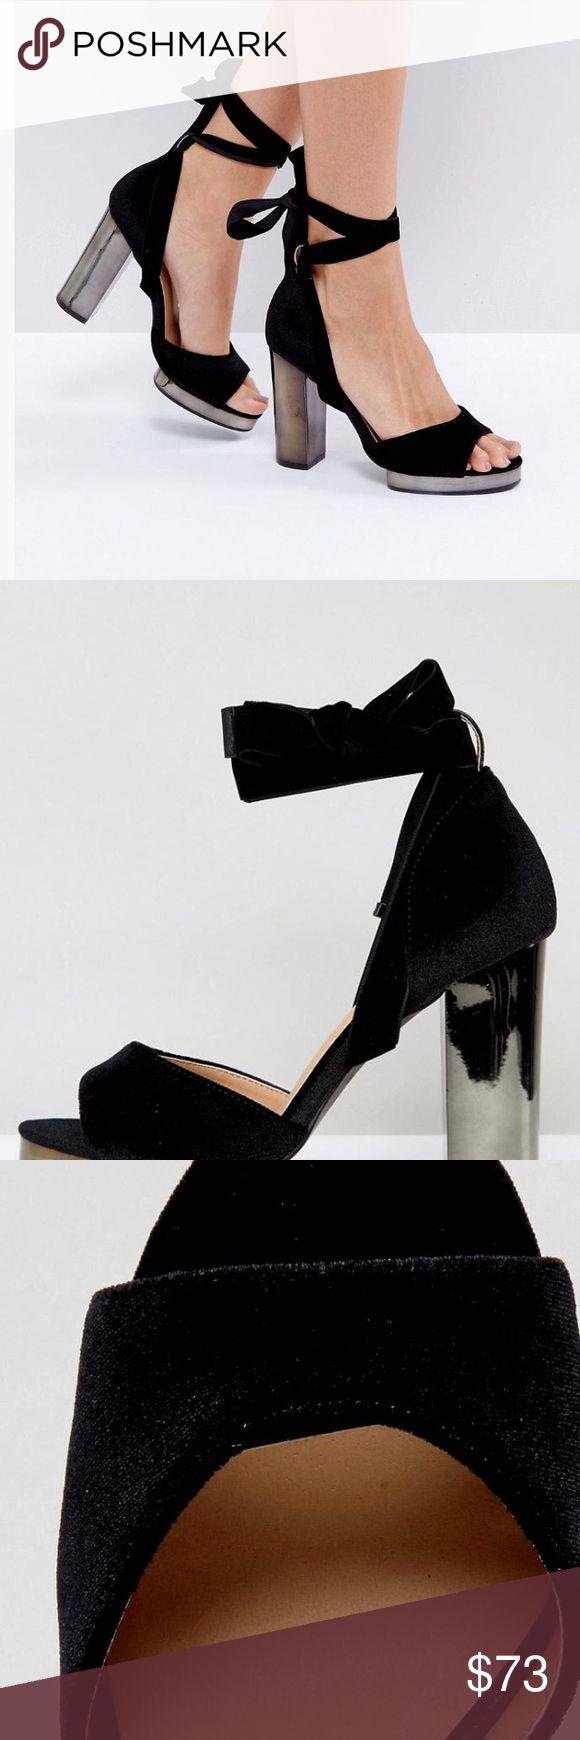 "💕Truffle Collection Slim Tie Up Platform Sandals Sandals by Truffle Textile upper Tie fastening Peep toe Block high heel Platform sole Wipe clean 100% Textile Upper Heel height: 10.3cm/4"" Shoes Sandals"